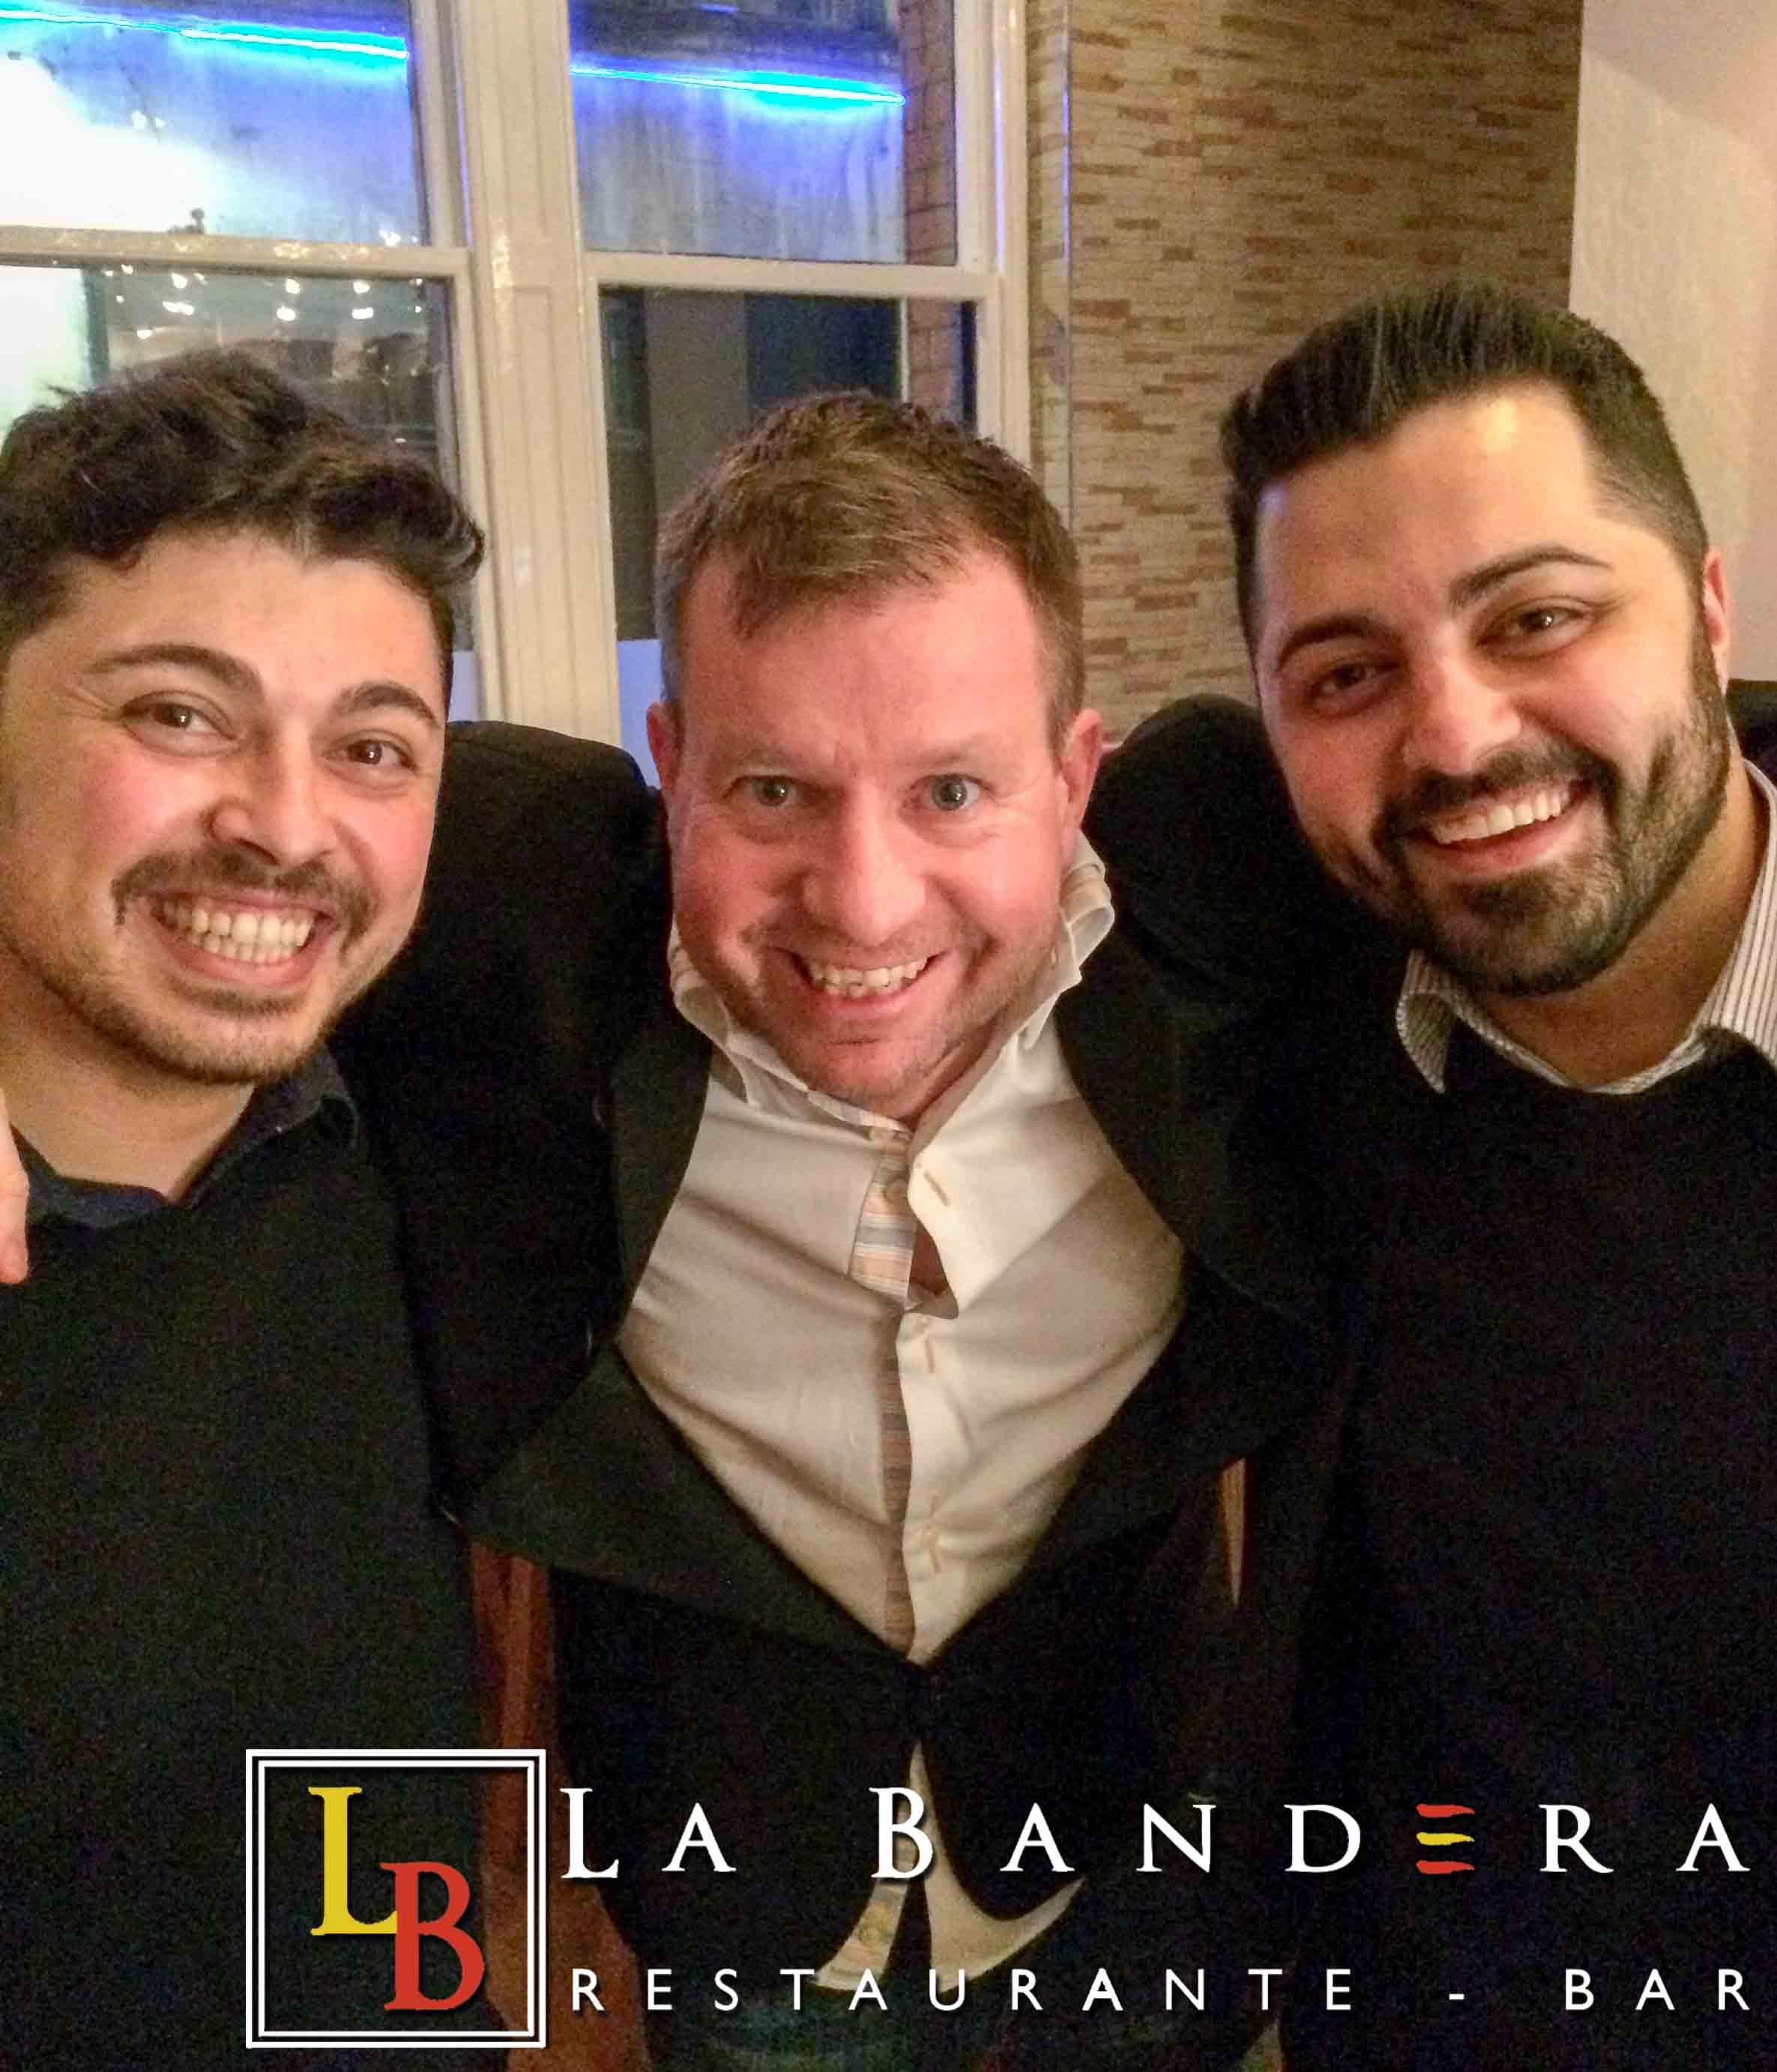 Andrew Nutter at La Bandera Restaurant